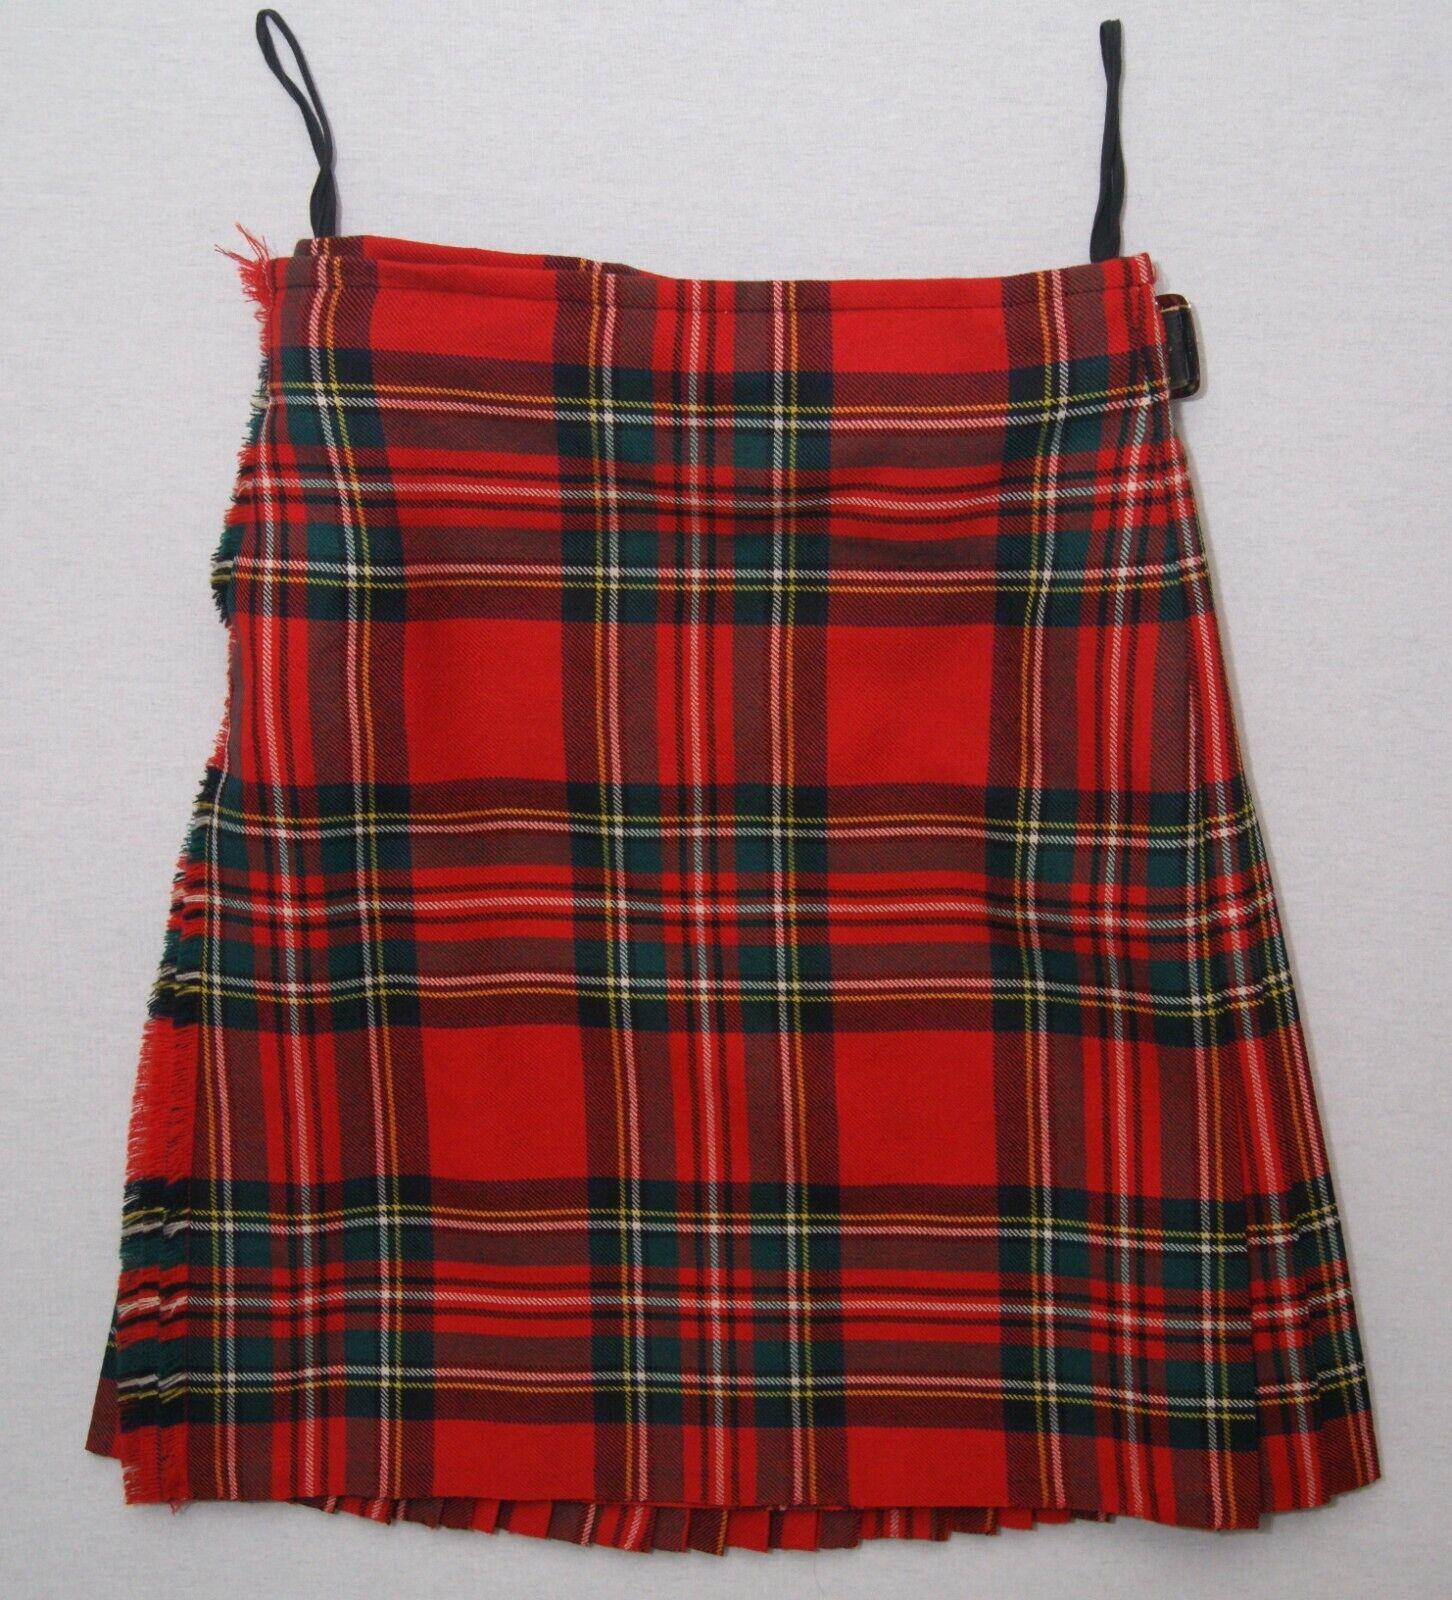 Stewart Royal Modern tartan men's pure wool Scottish 8 yard kilt 30